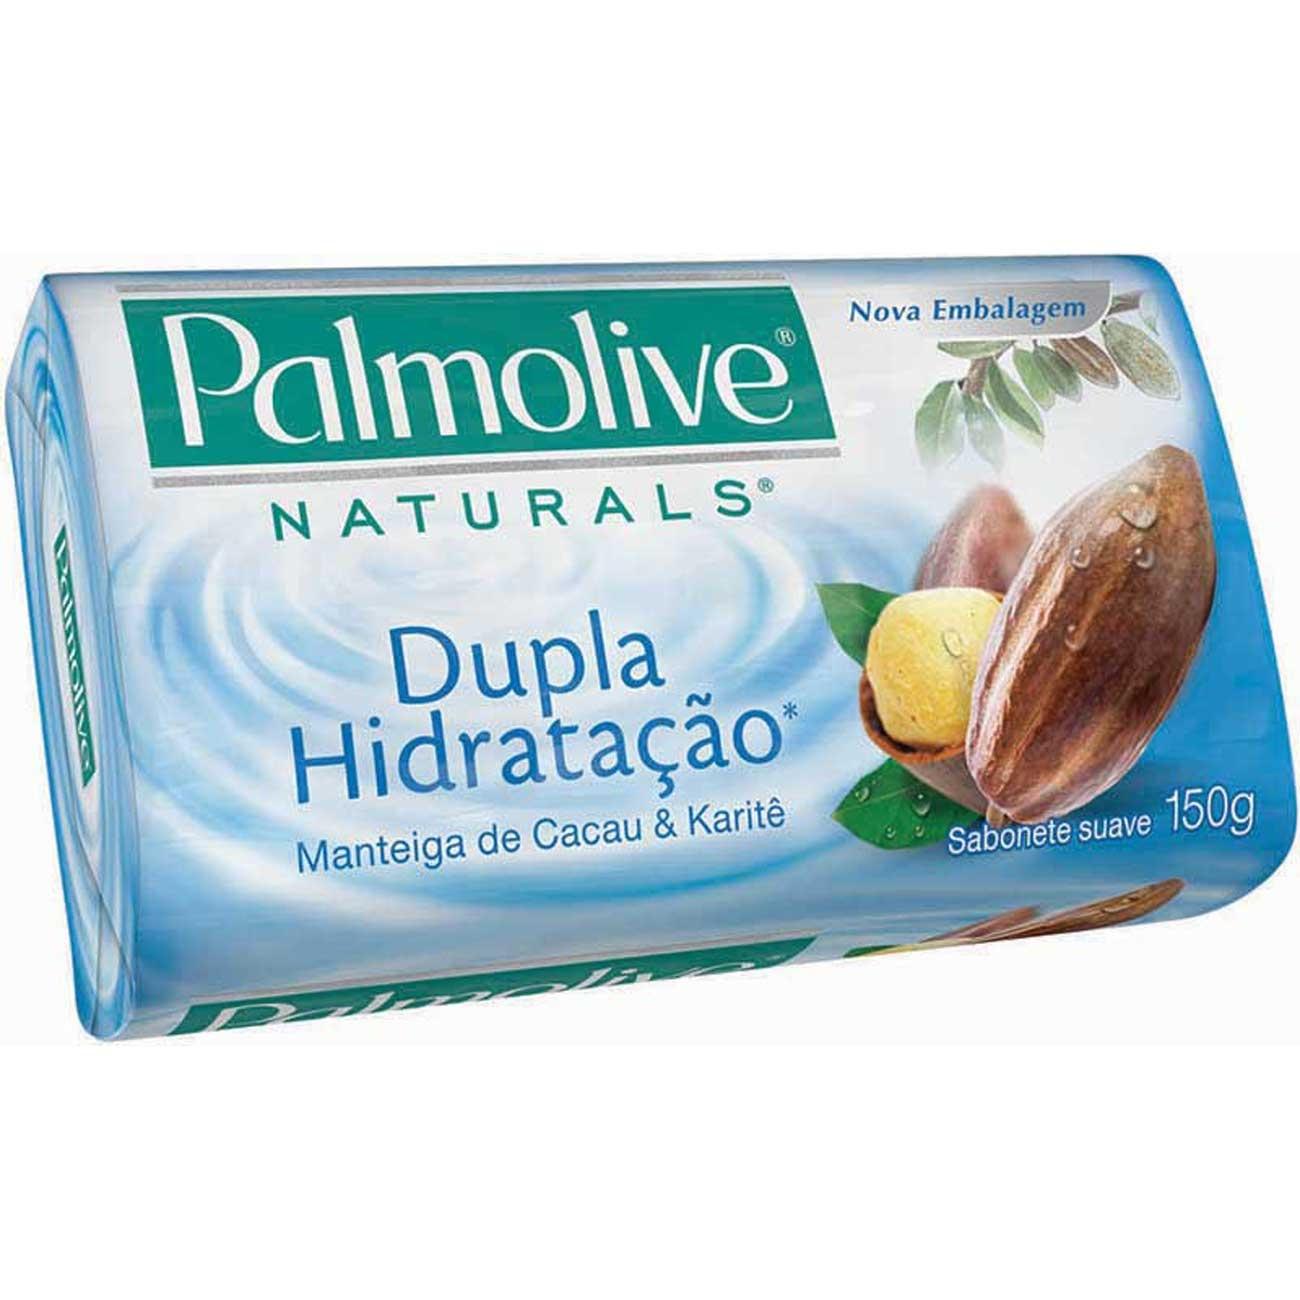 Sabonete em Barra Palmolive Naturals Hidratacao Dupla Hidracao 150g